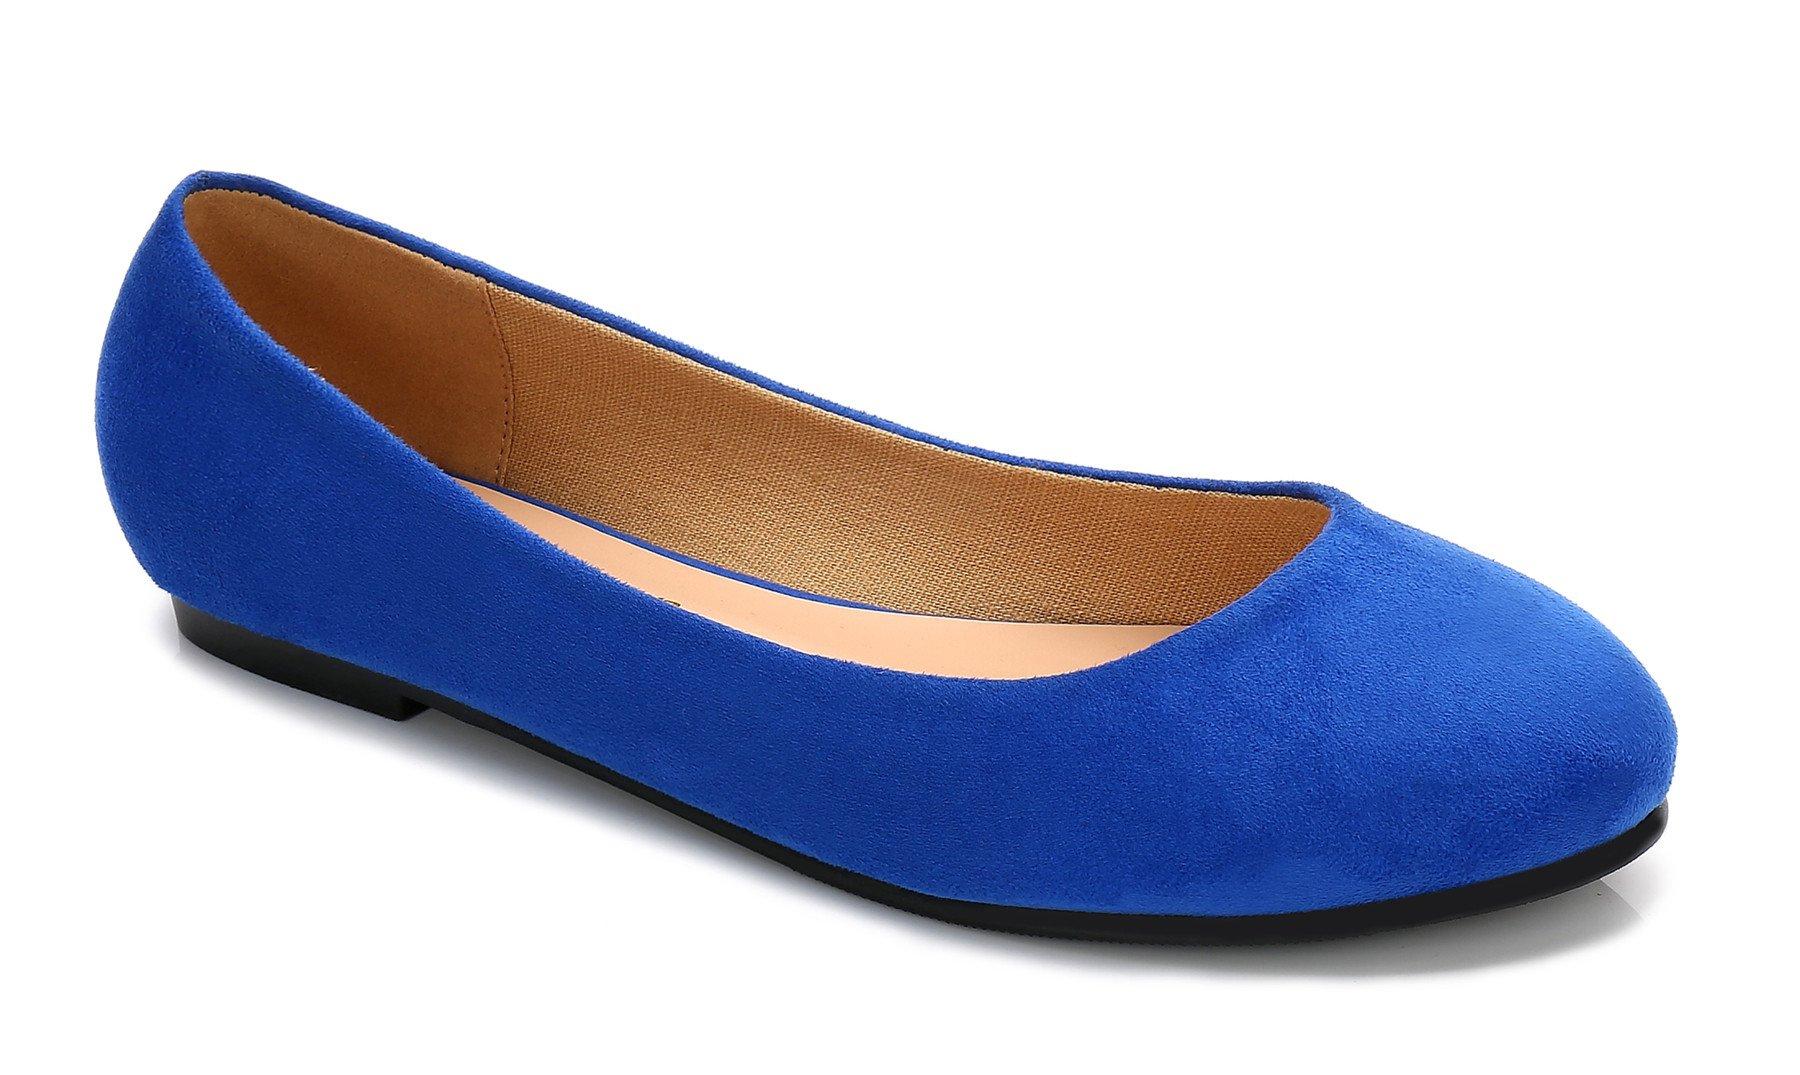 ComeShun Womens Shoes Cute Slip On Casual Ballet Flats